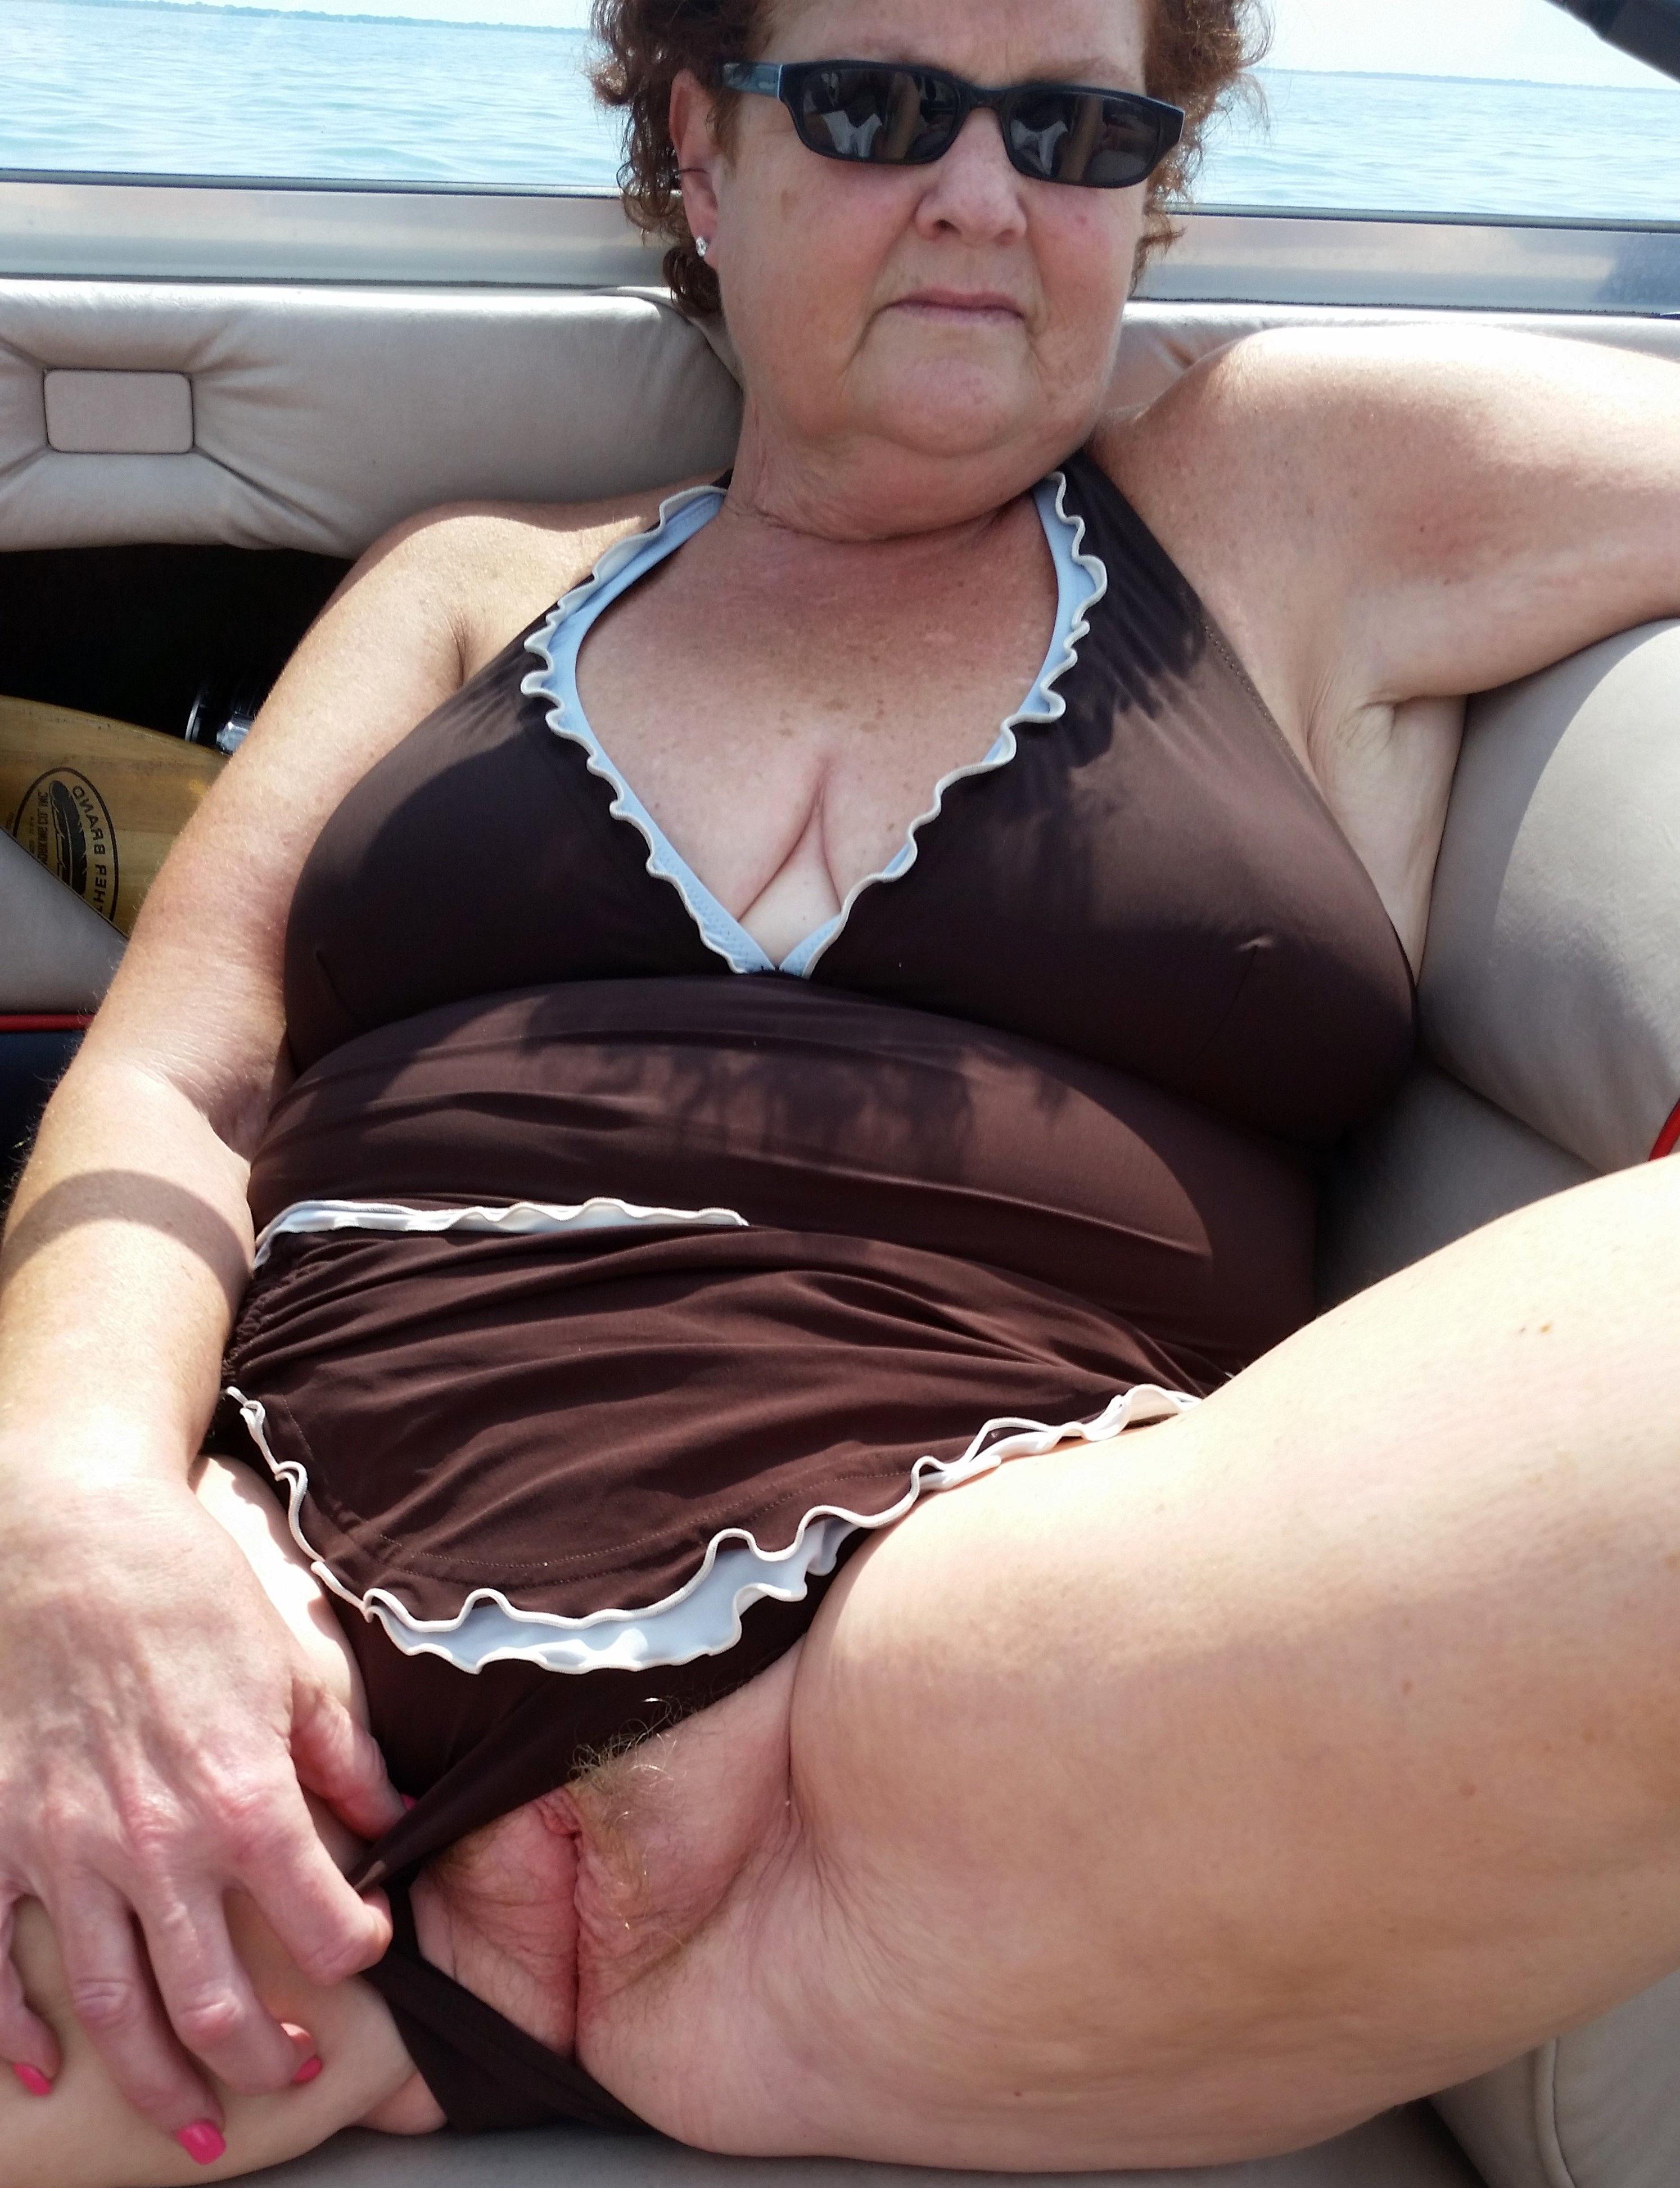 juggs naked ladies over 60